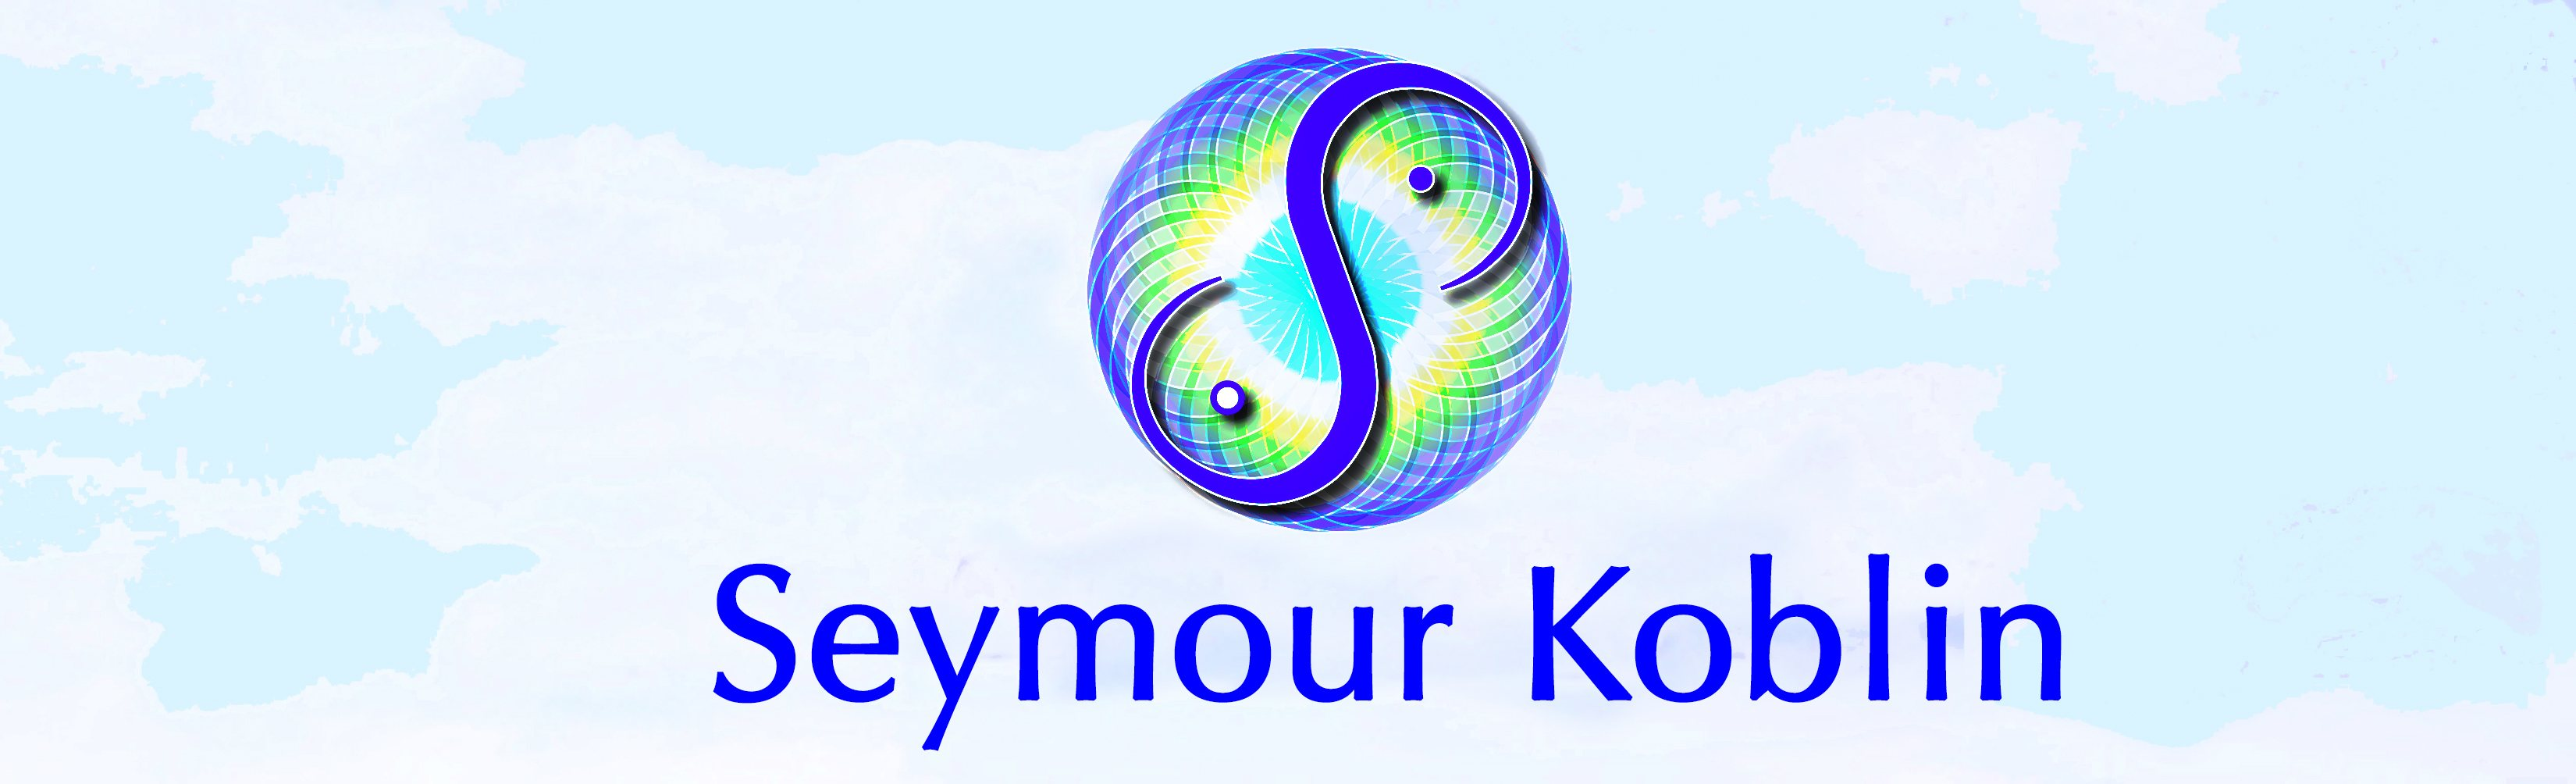 Seymour Koblin